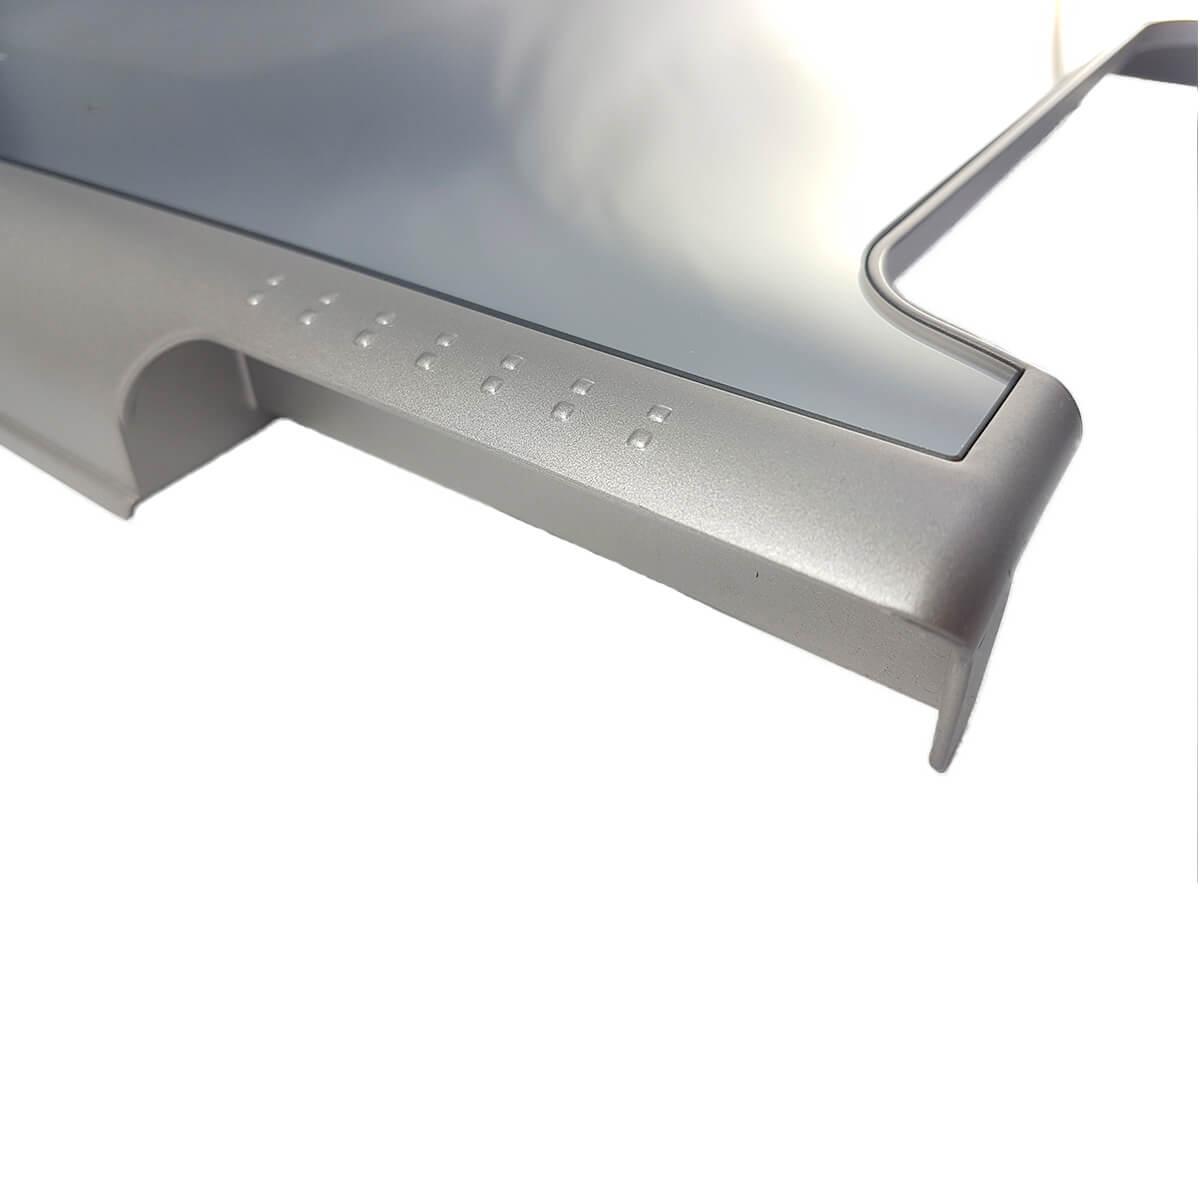 Painel Porta Com Visor Microondas Electrolux MI41S -  A08521901